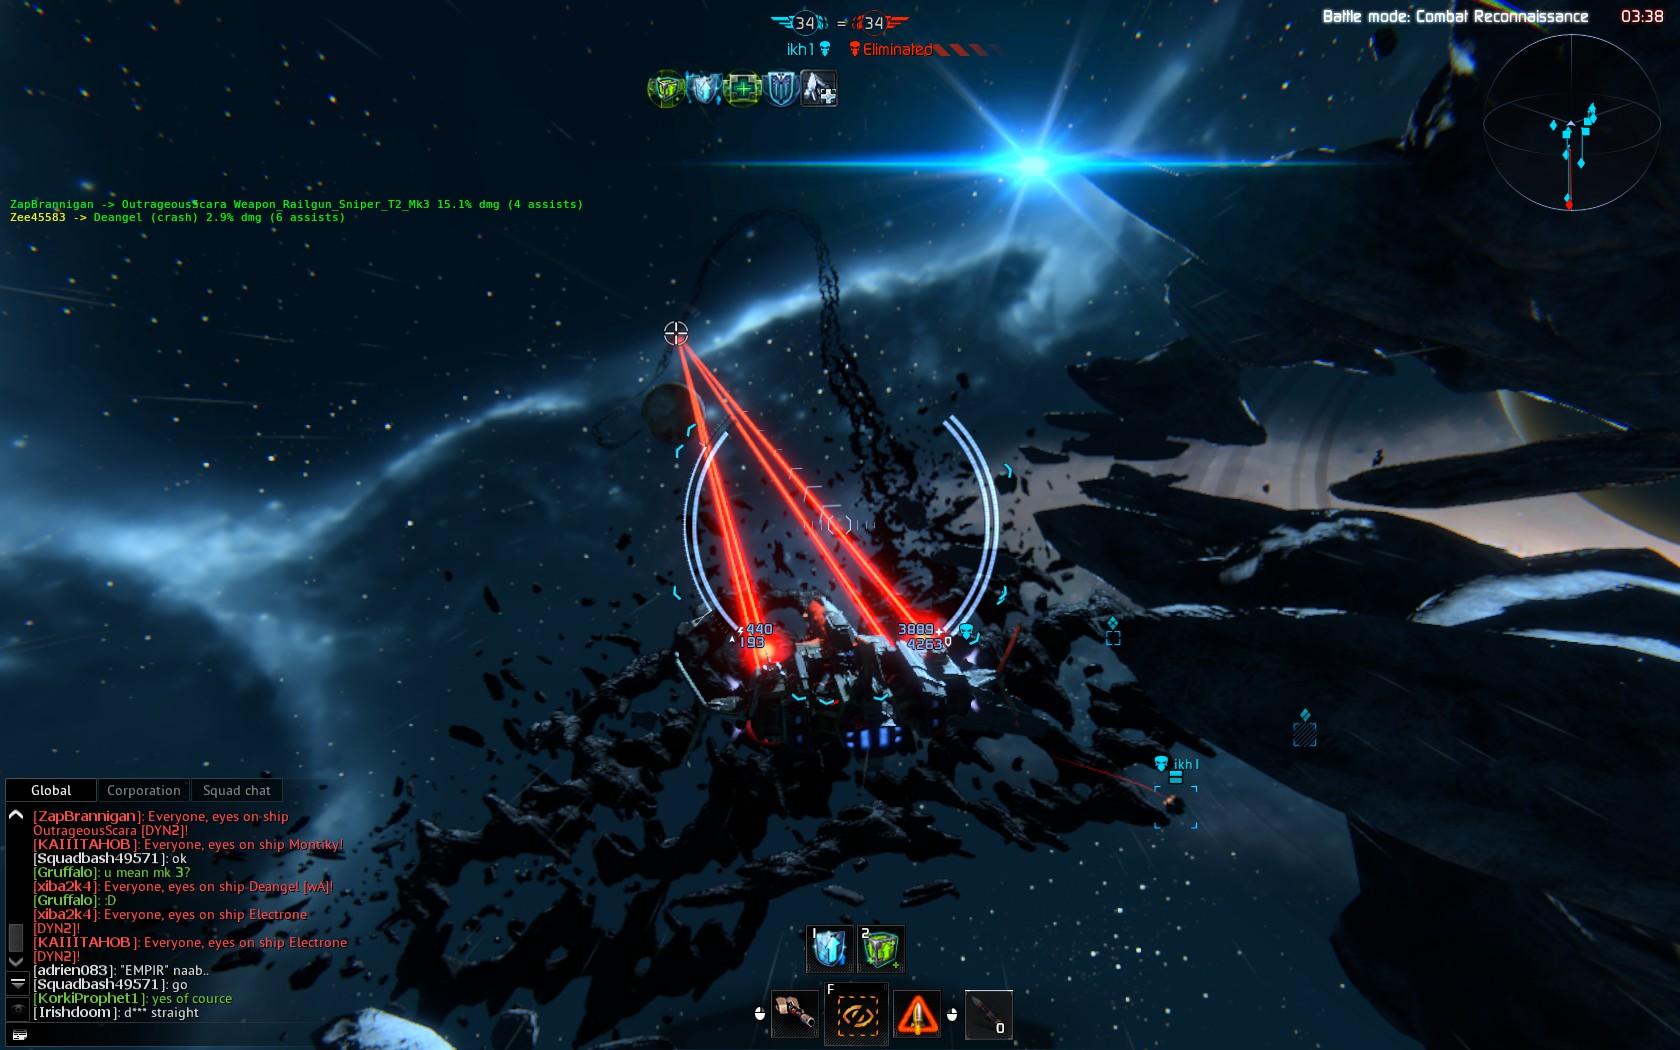 http://www.gamer.ru/system/attached_images/images/000/631/730/original/212070_screenshots_2013-05-09_00001.jpg